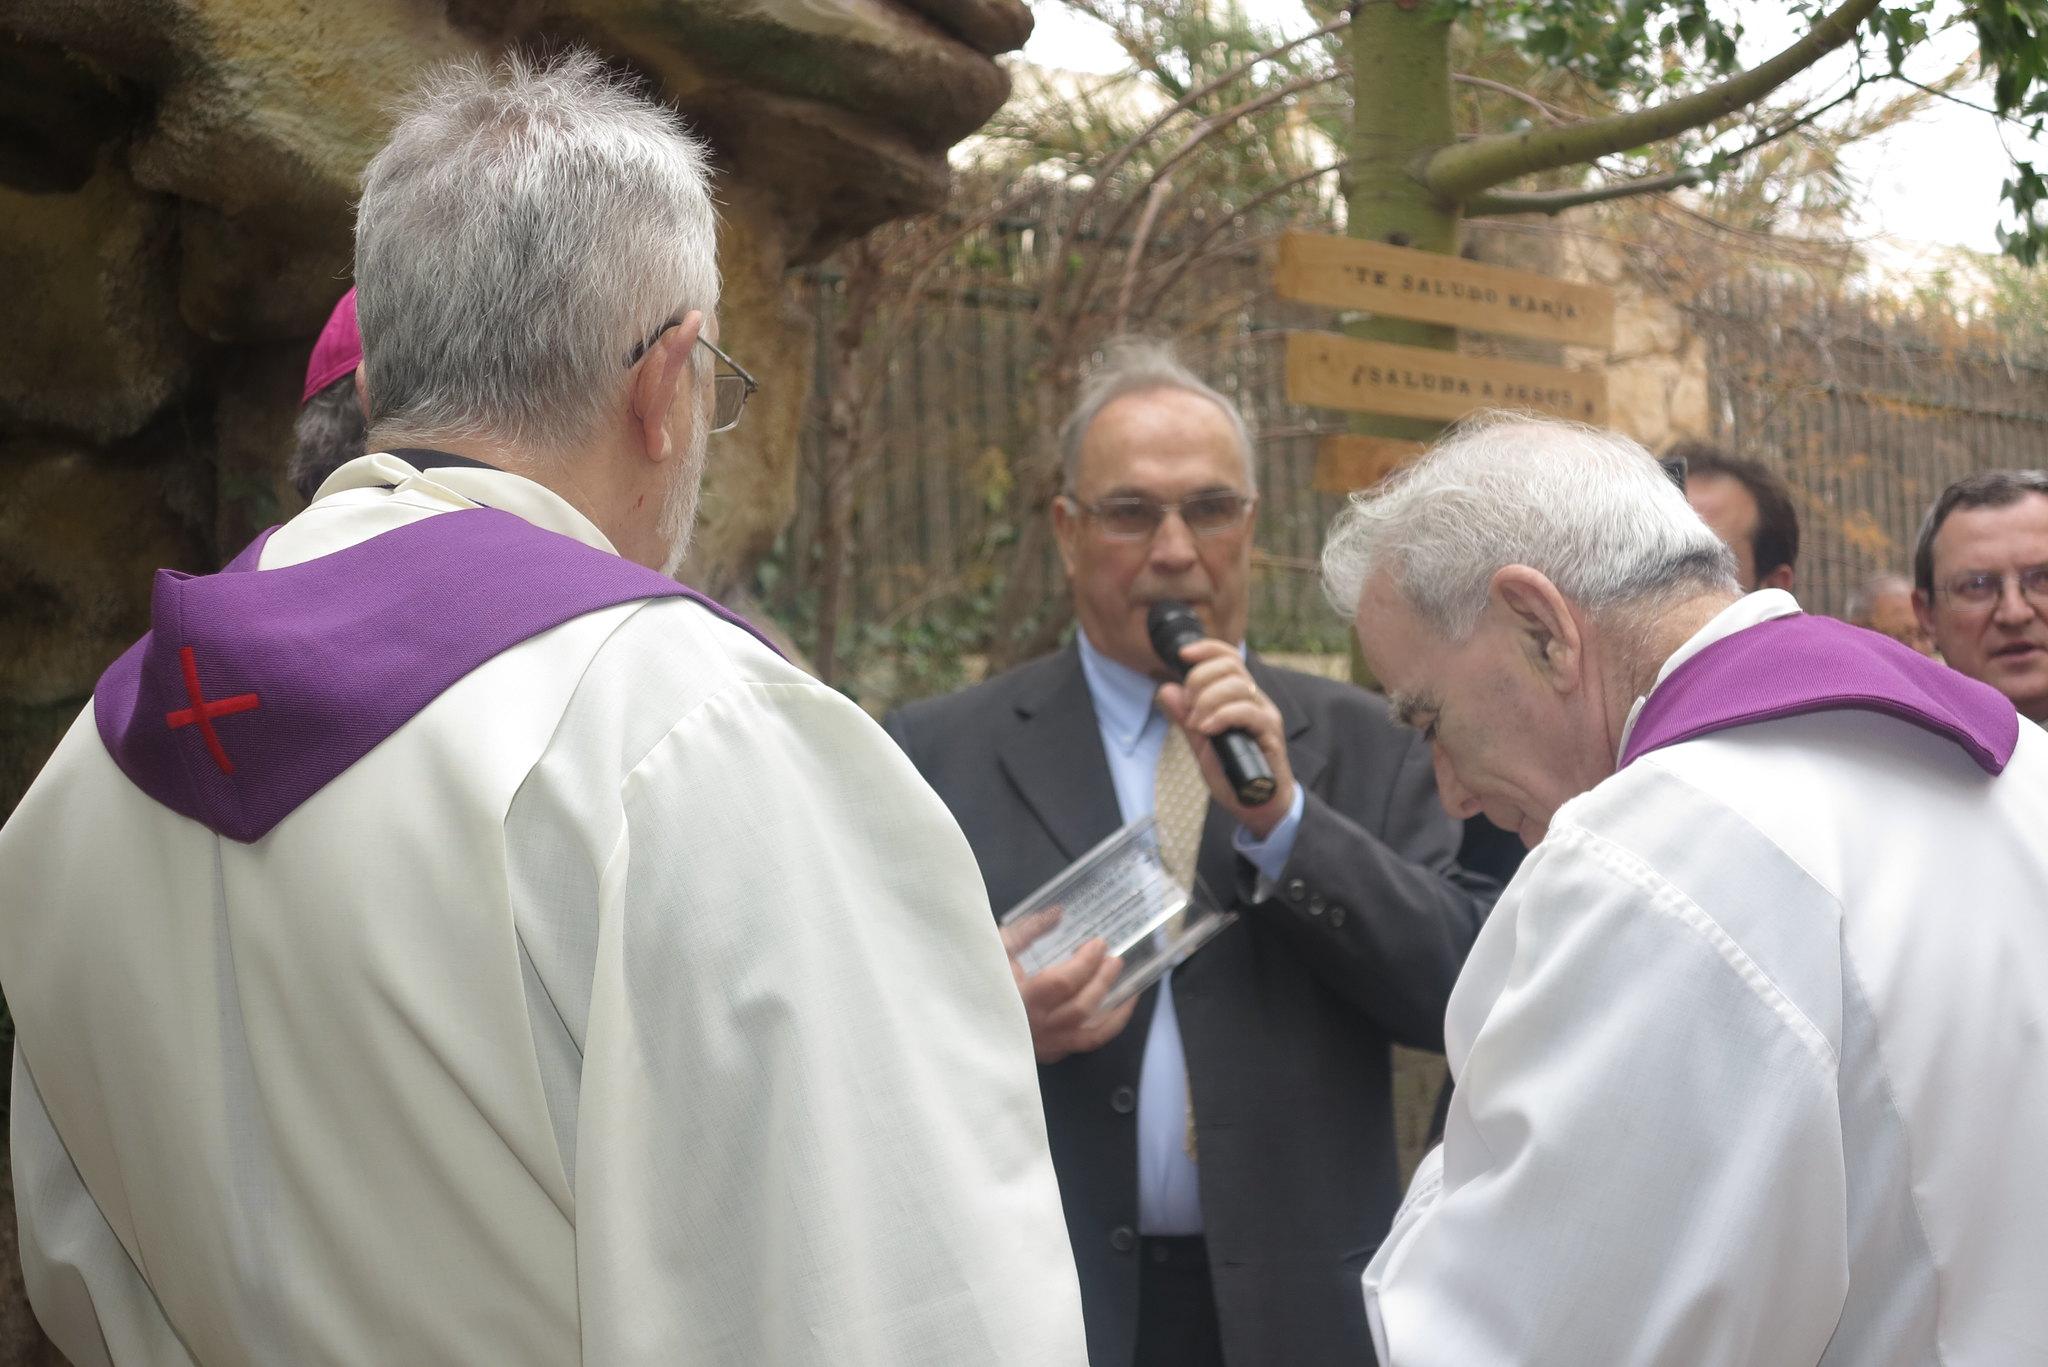 (2016-02-13) - Inauguración Virgen de Lourdes, La Molineta - Archivo La Molineta 2 (53)